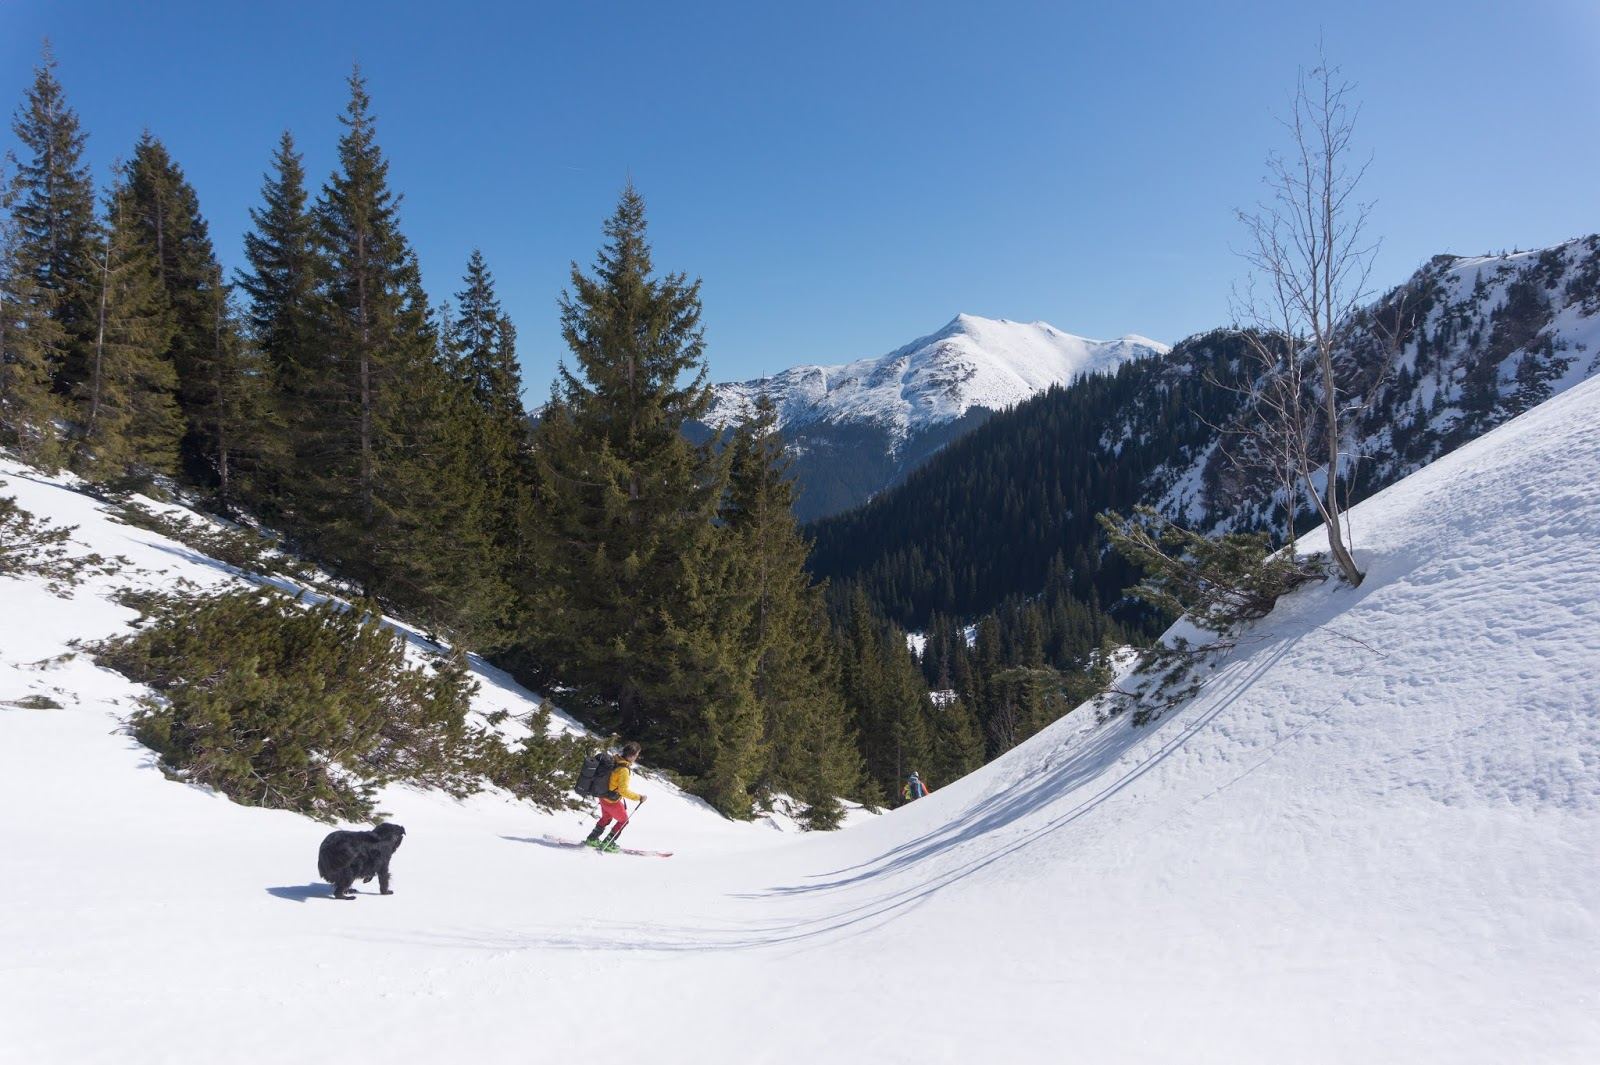 Priveliștea spre vârful Puzdrele - Alina Cîrja